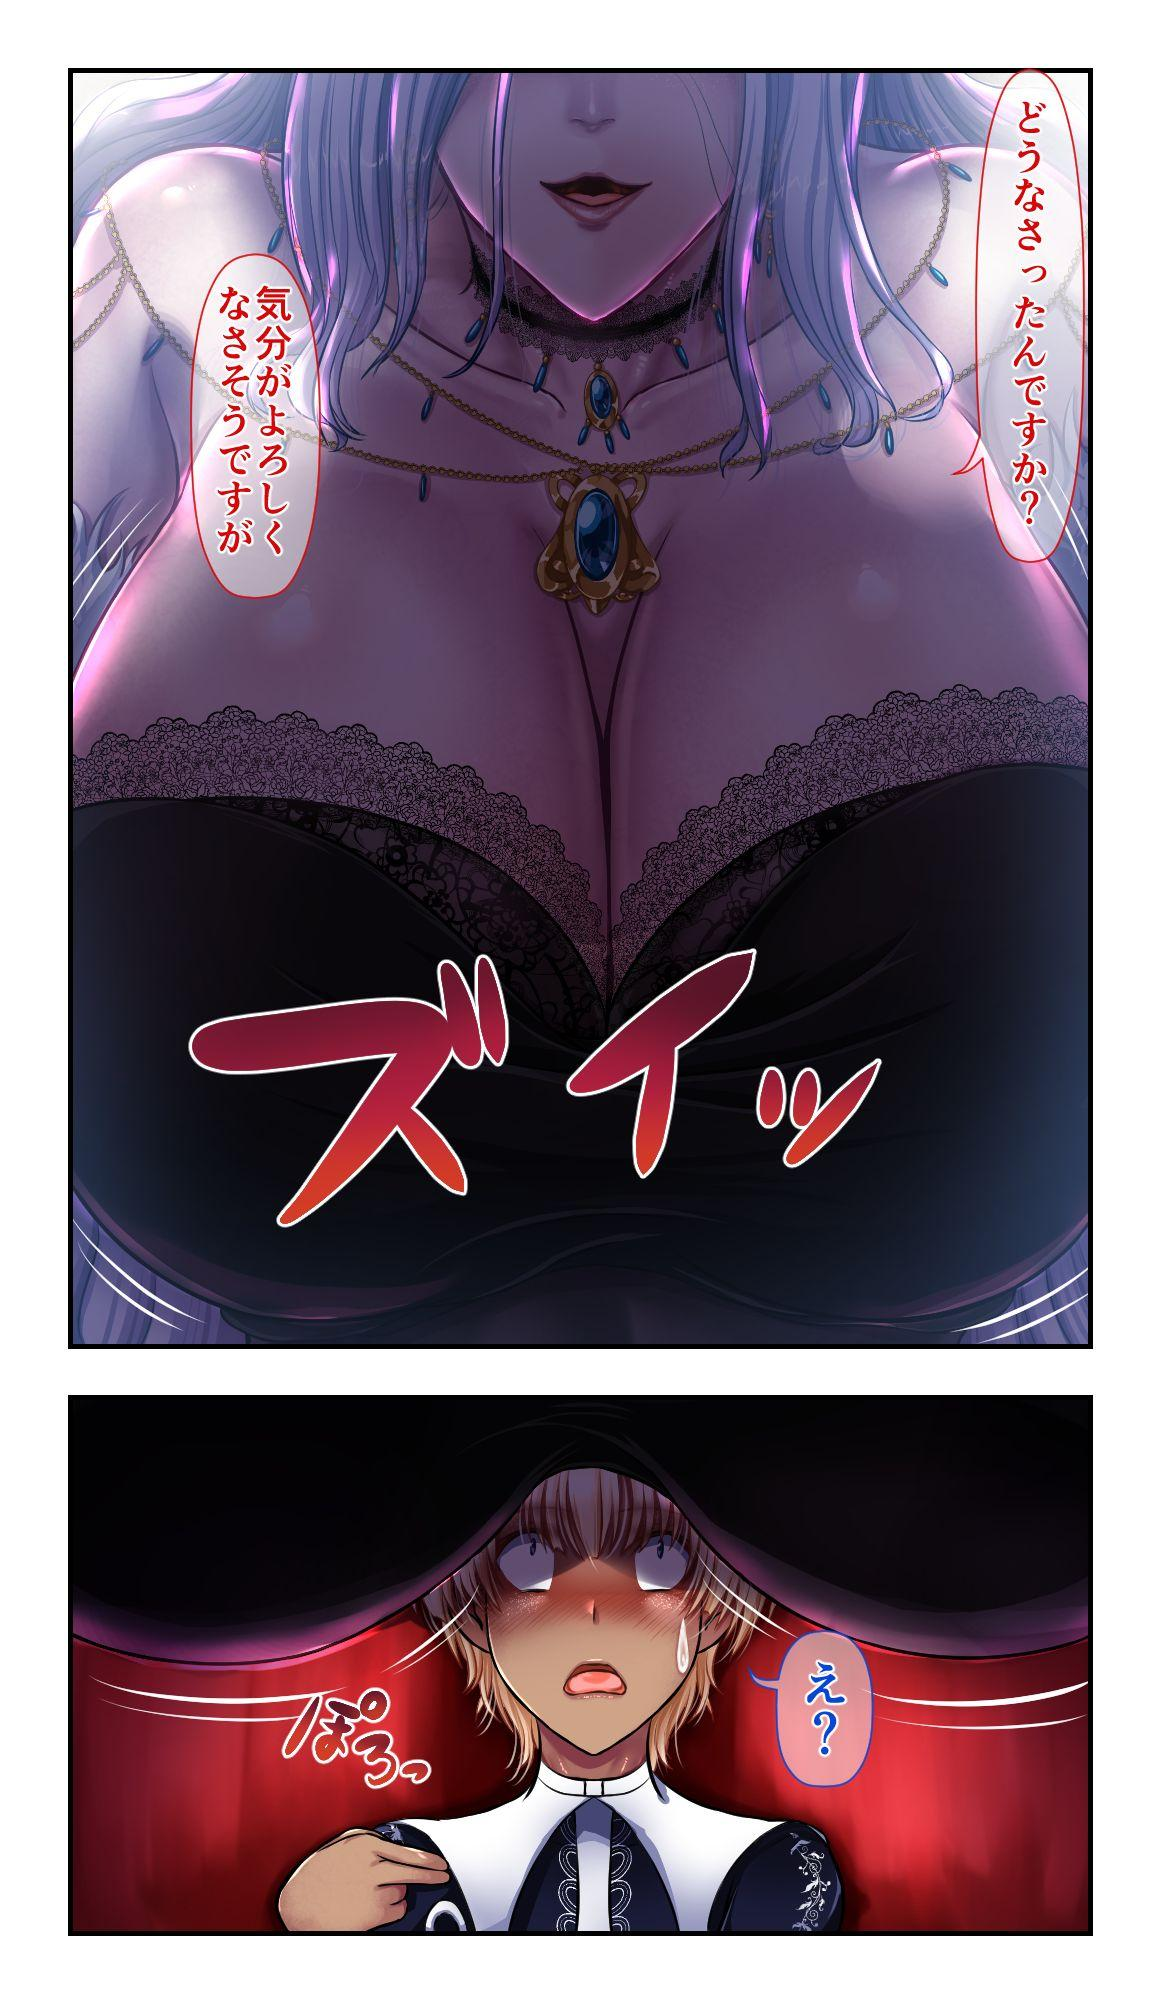 SweetEdda vol. 5 Nyuuma Hen Hitokui Chibusa no Mamelon 6